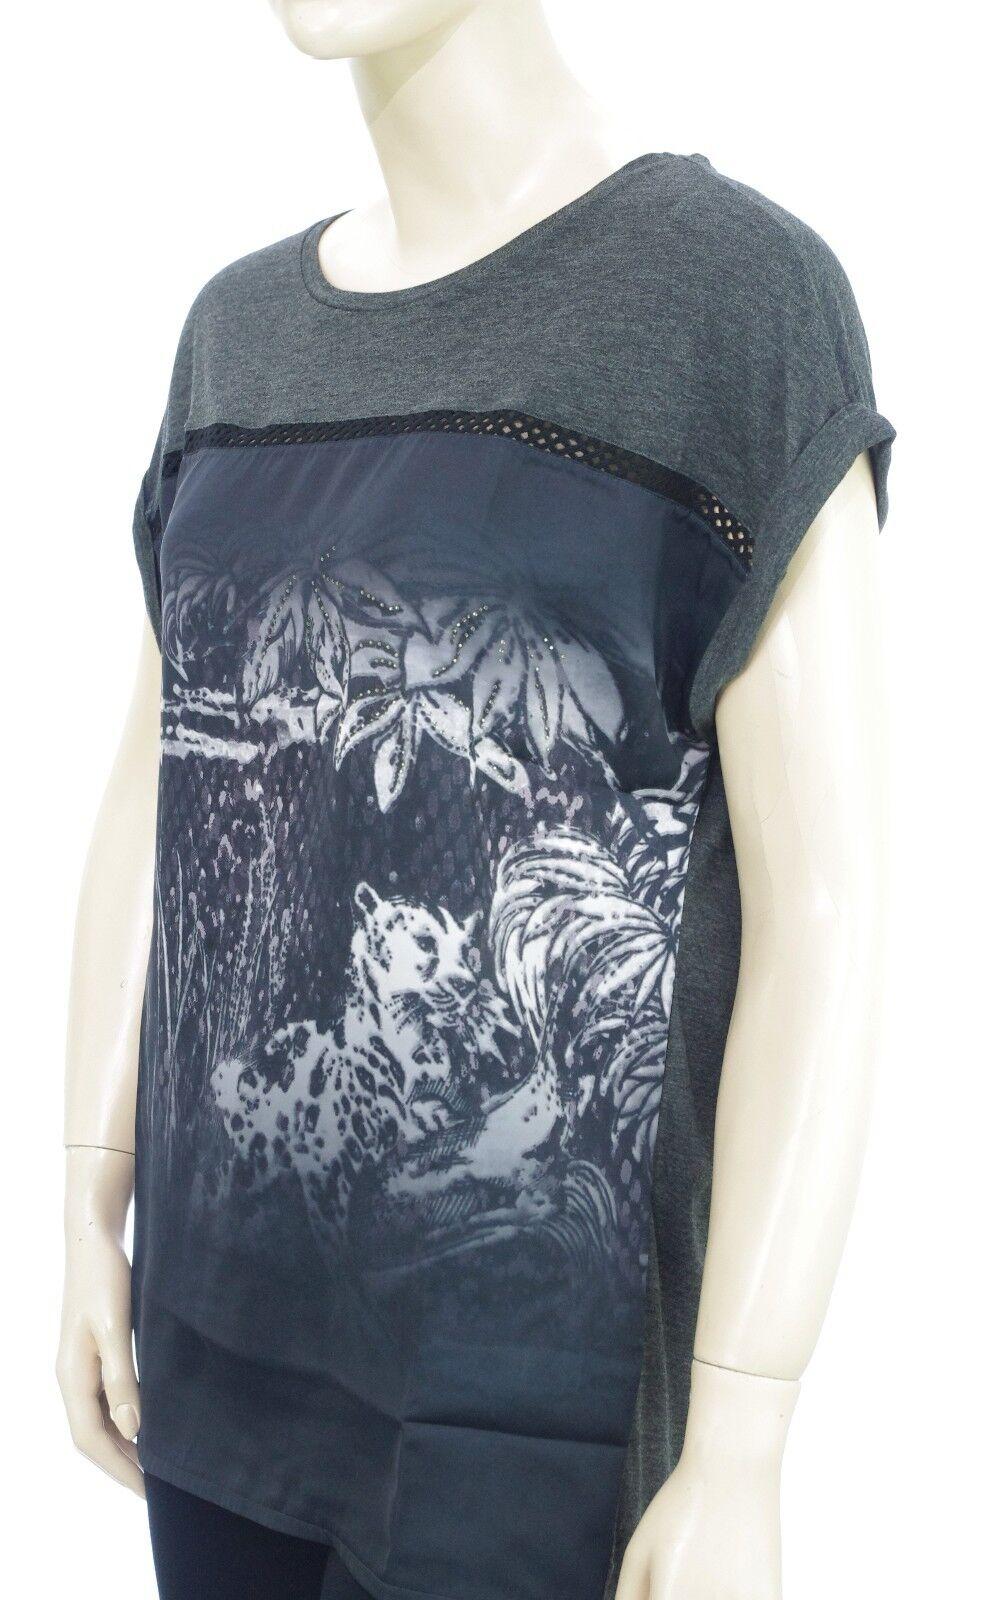 ac626caba68 Tee Shirt oversized DESIGUAL femme forme large. TS LEOPARD DEGRADE